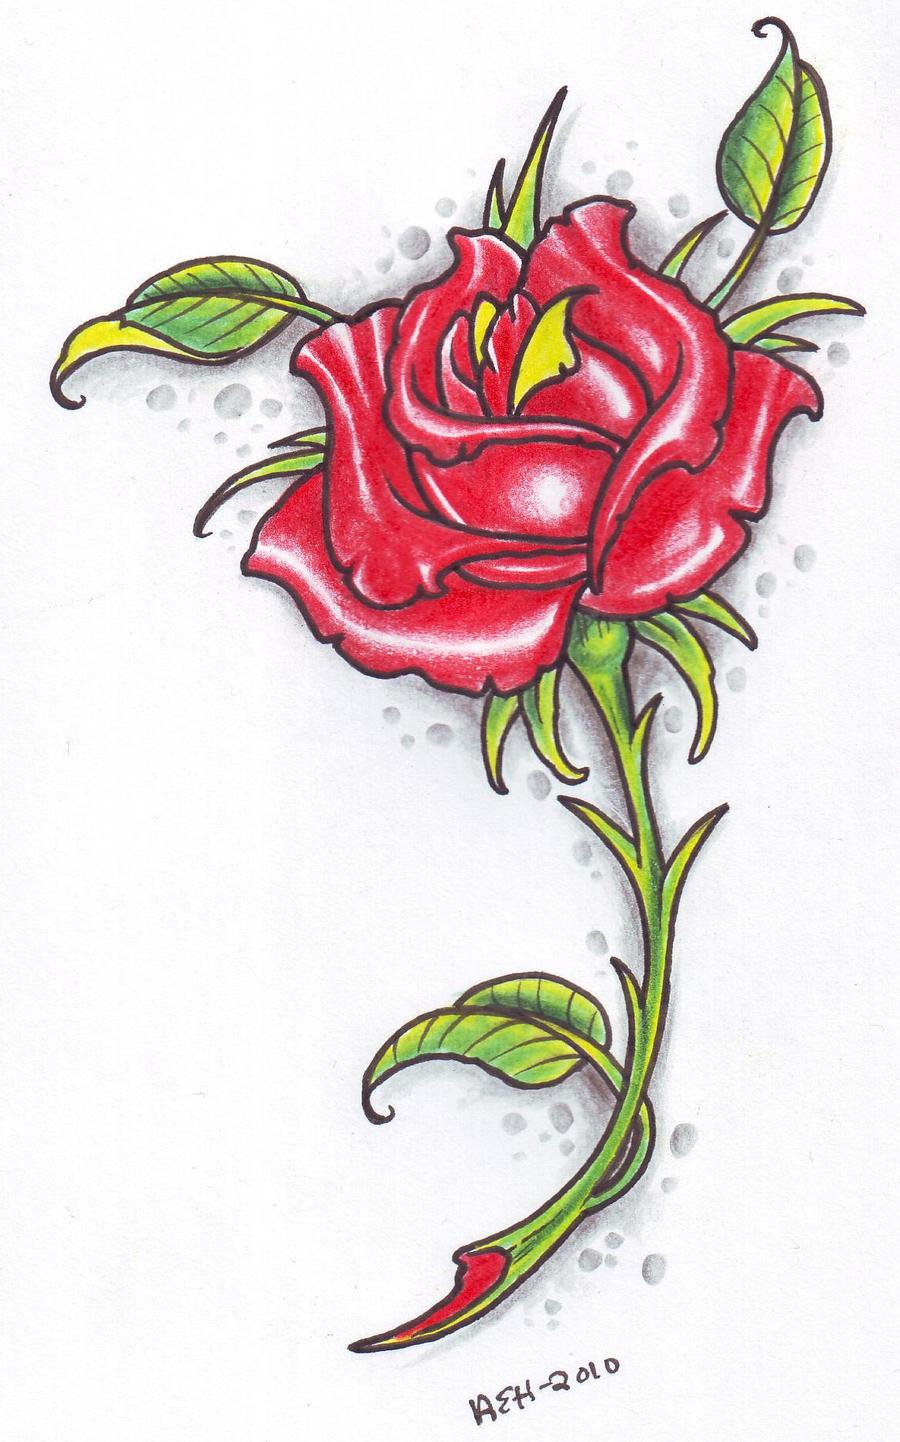 Rose tattoo design 2010 by vikingtattoo on deviantart for Free rose tattoo stencils